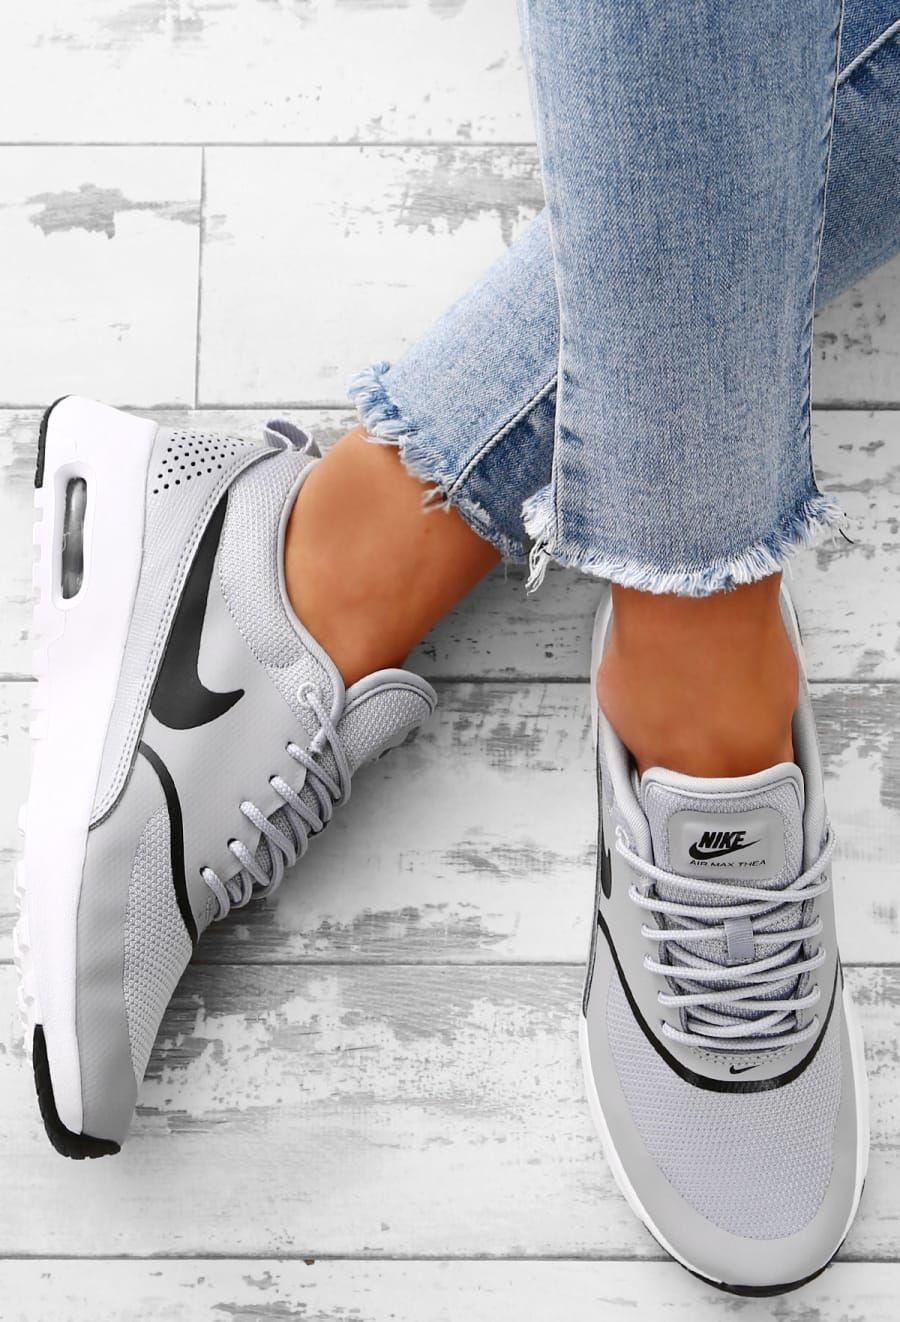 Women's sneakers: Nike Air Max 'Thea' in grey Need